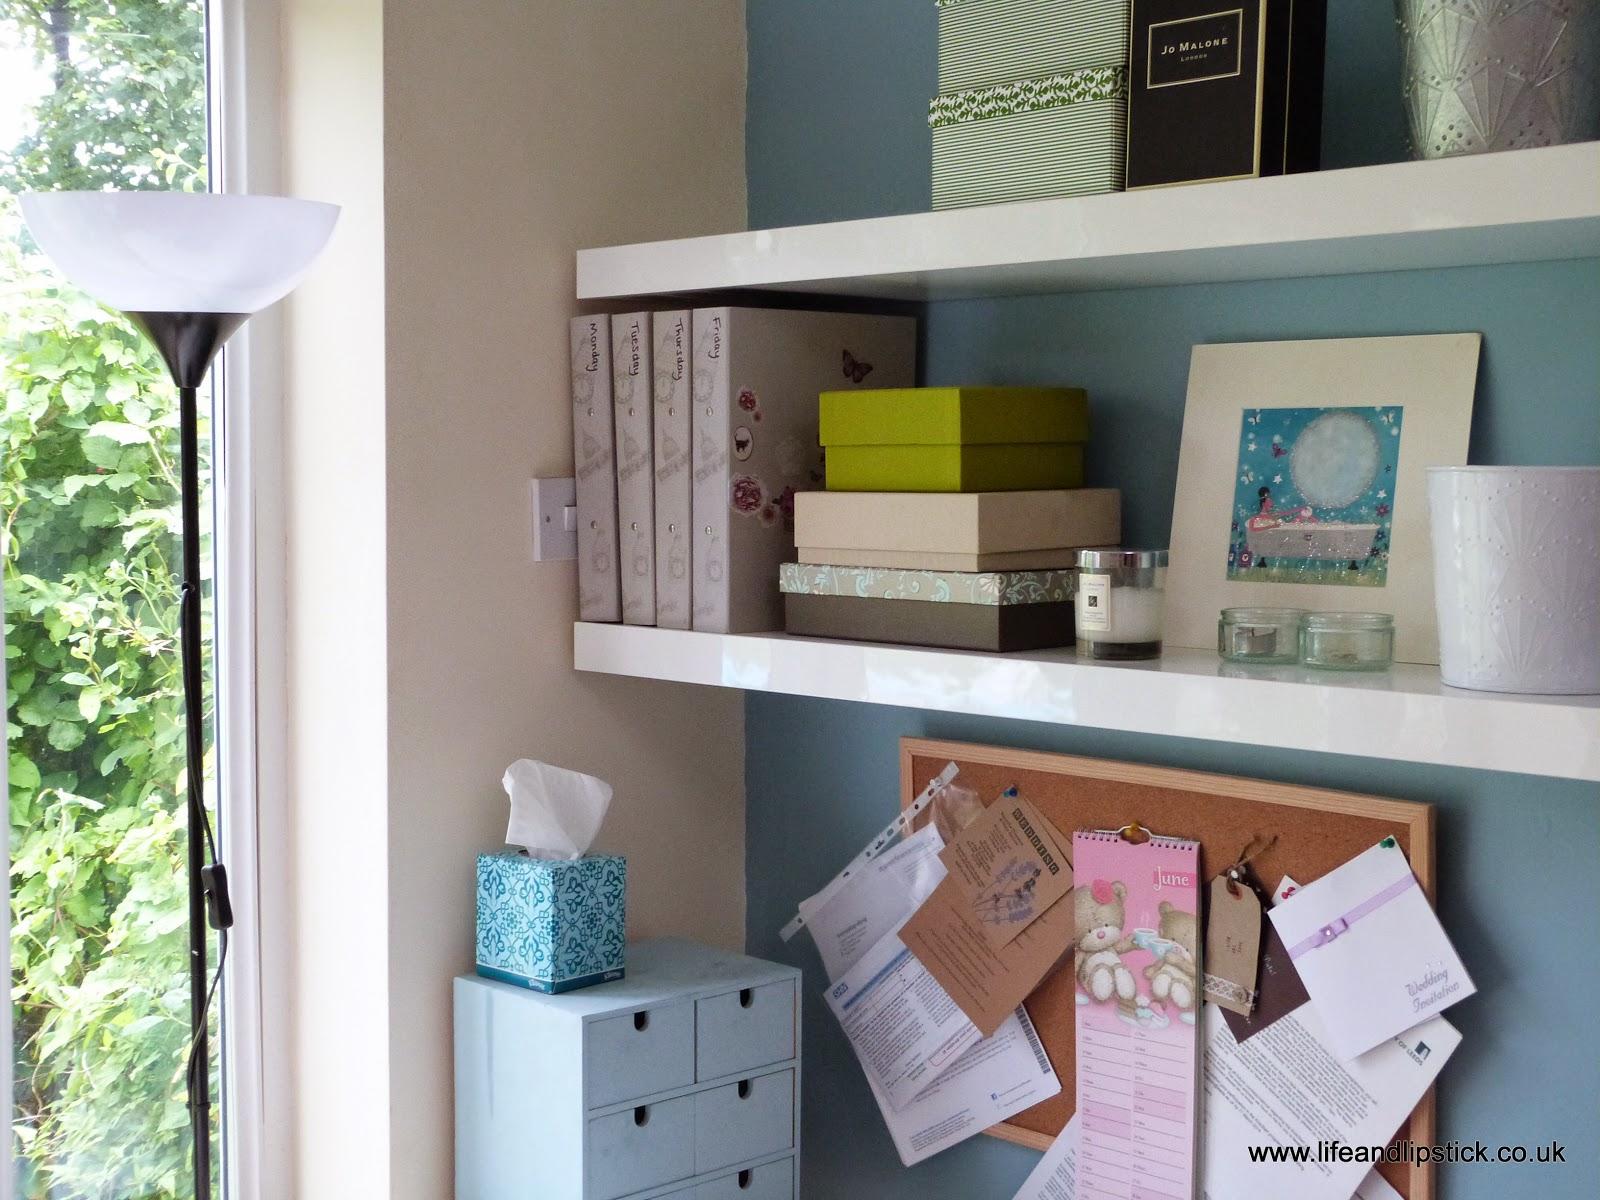 interior design, design ideas, desk, pin board, ikea shelves